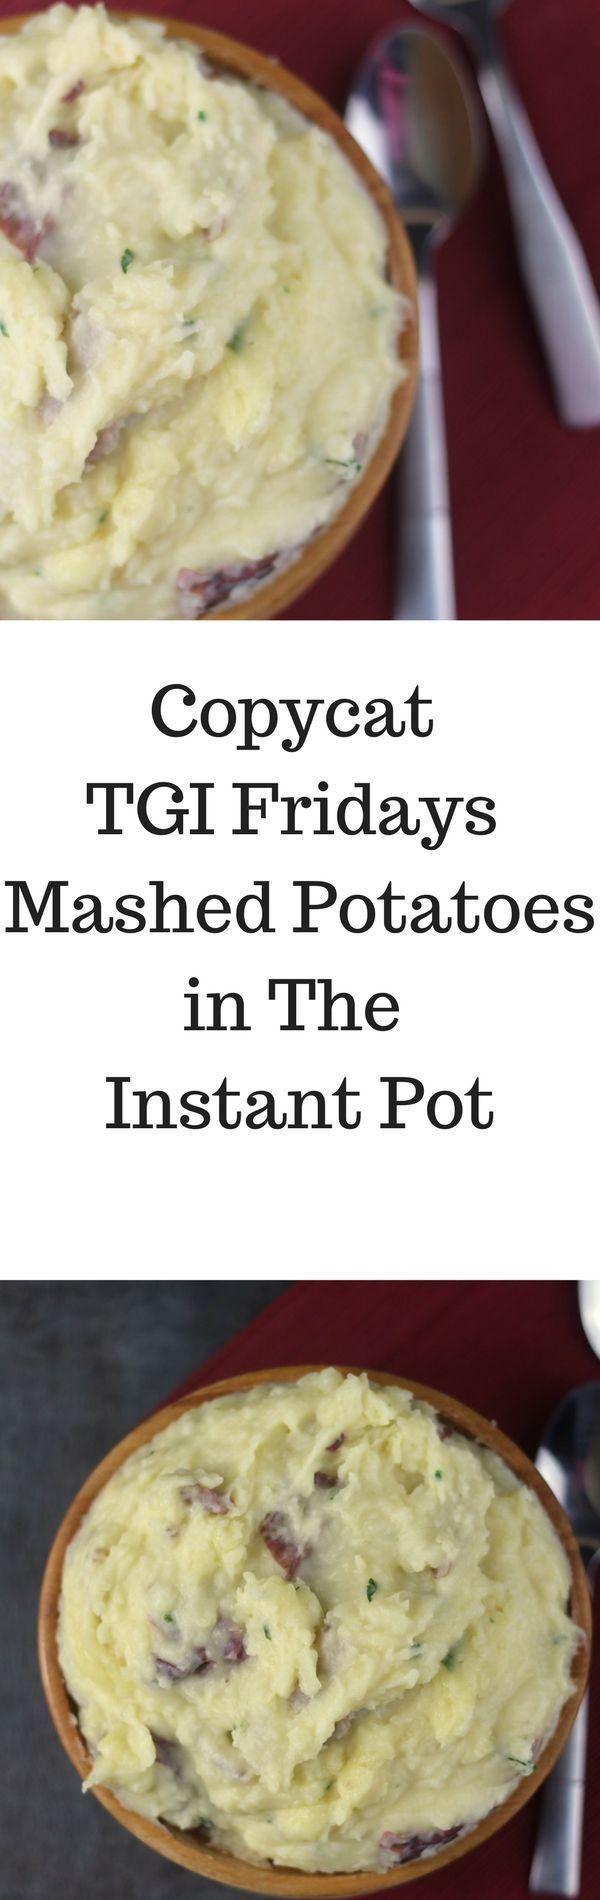 Copycat TGI Fridays Mashed Potatoes in The Instant Pot